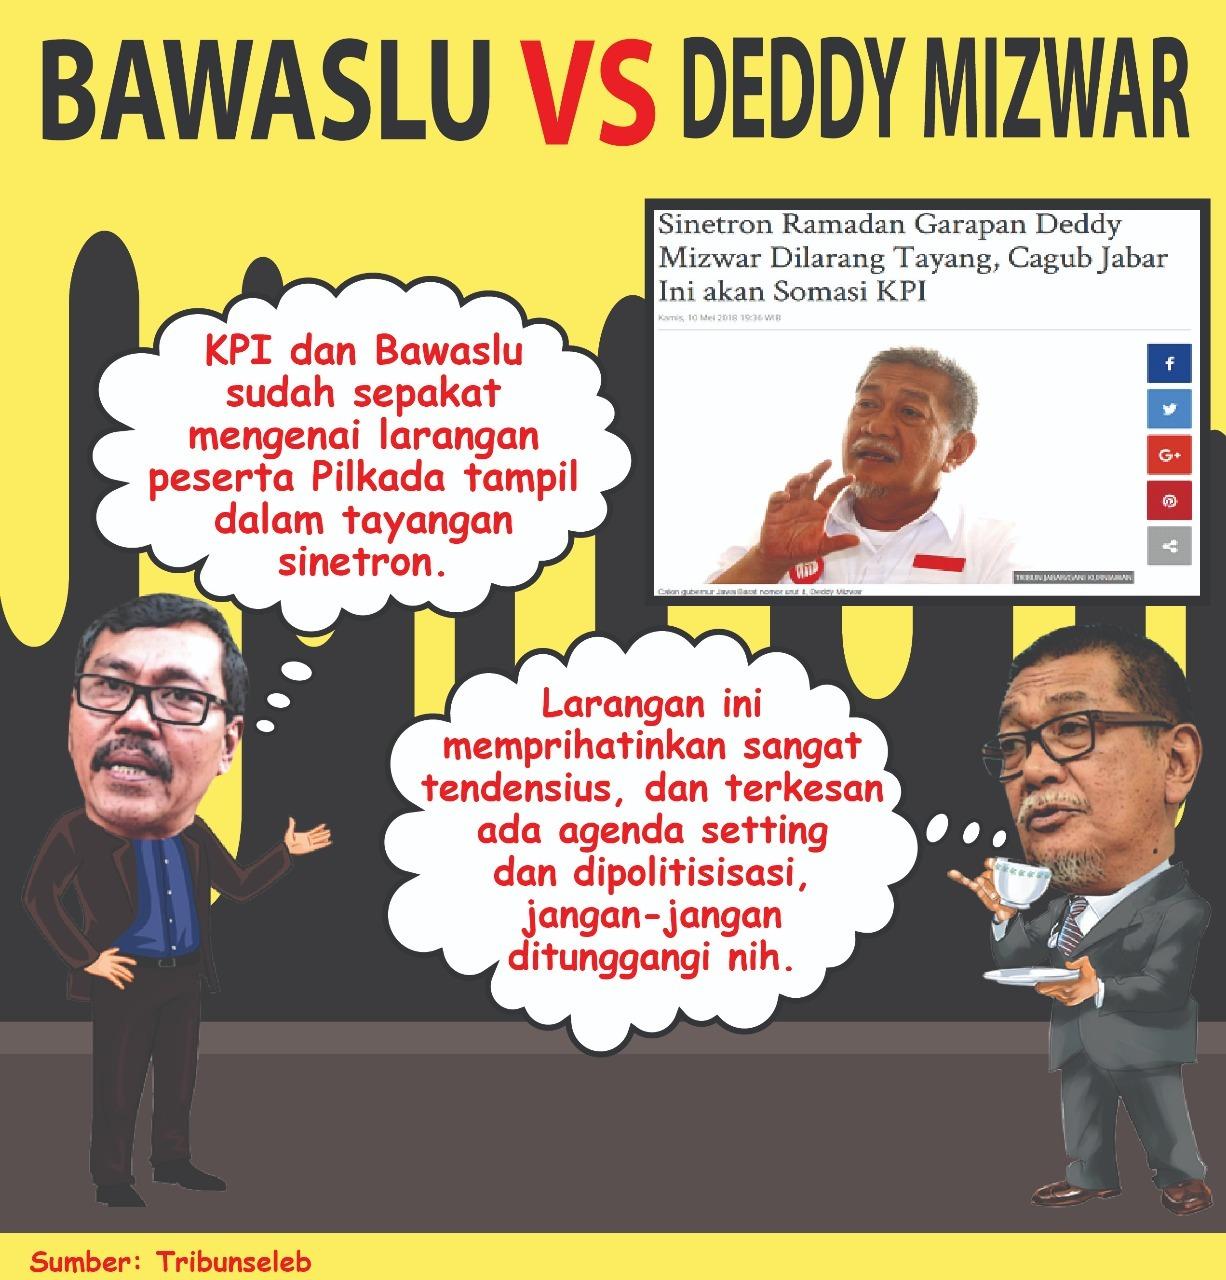 Bawaslu VS Deddy Mizwar